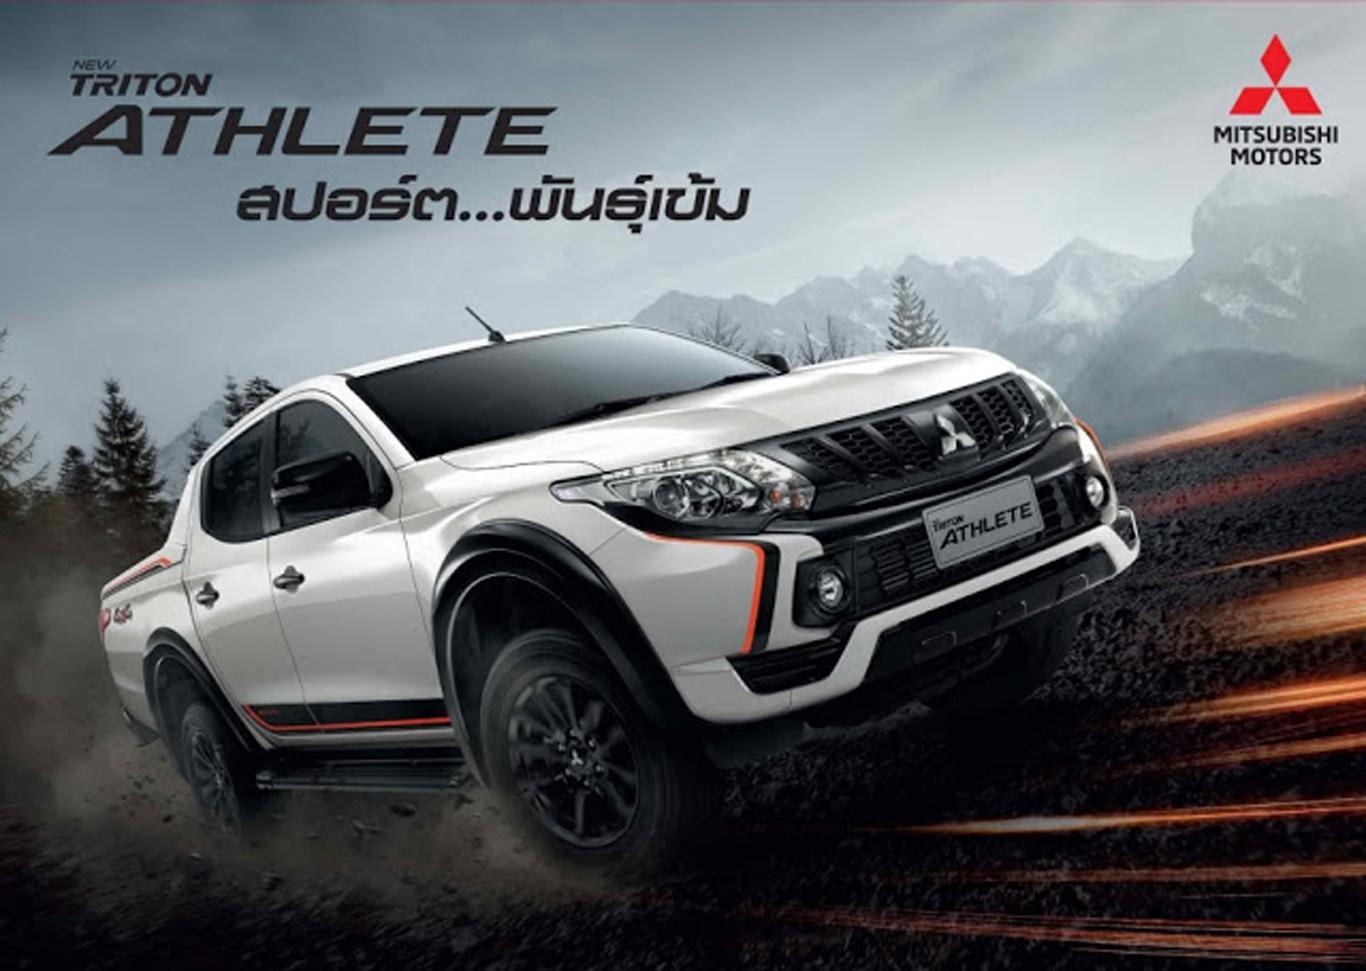 autopress-mitsubishi-triton-athlete-5